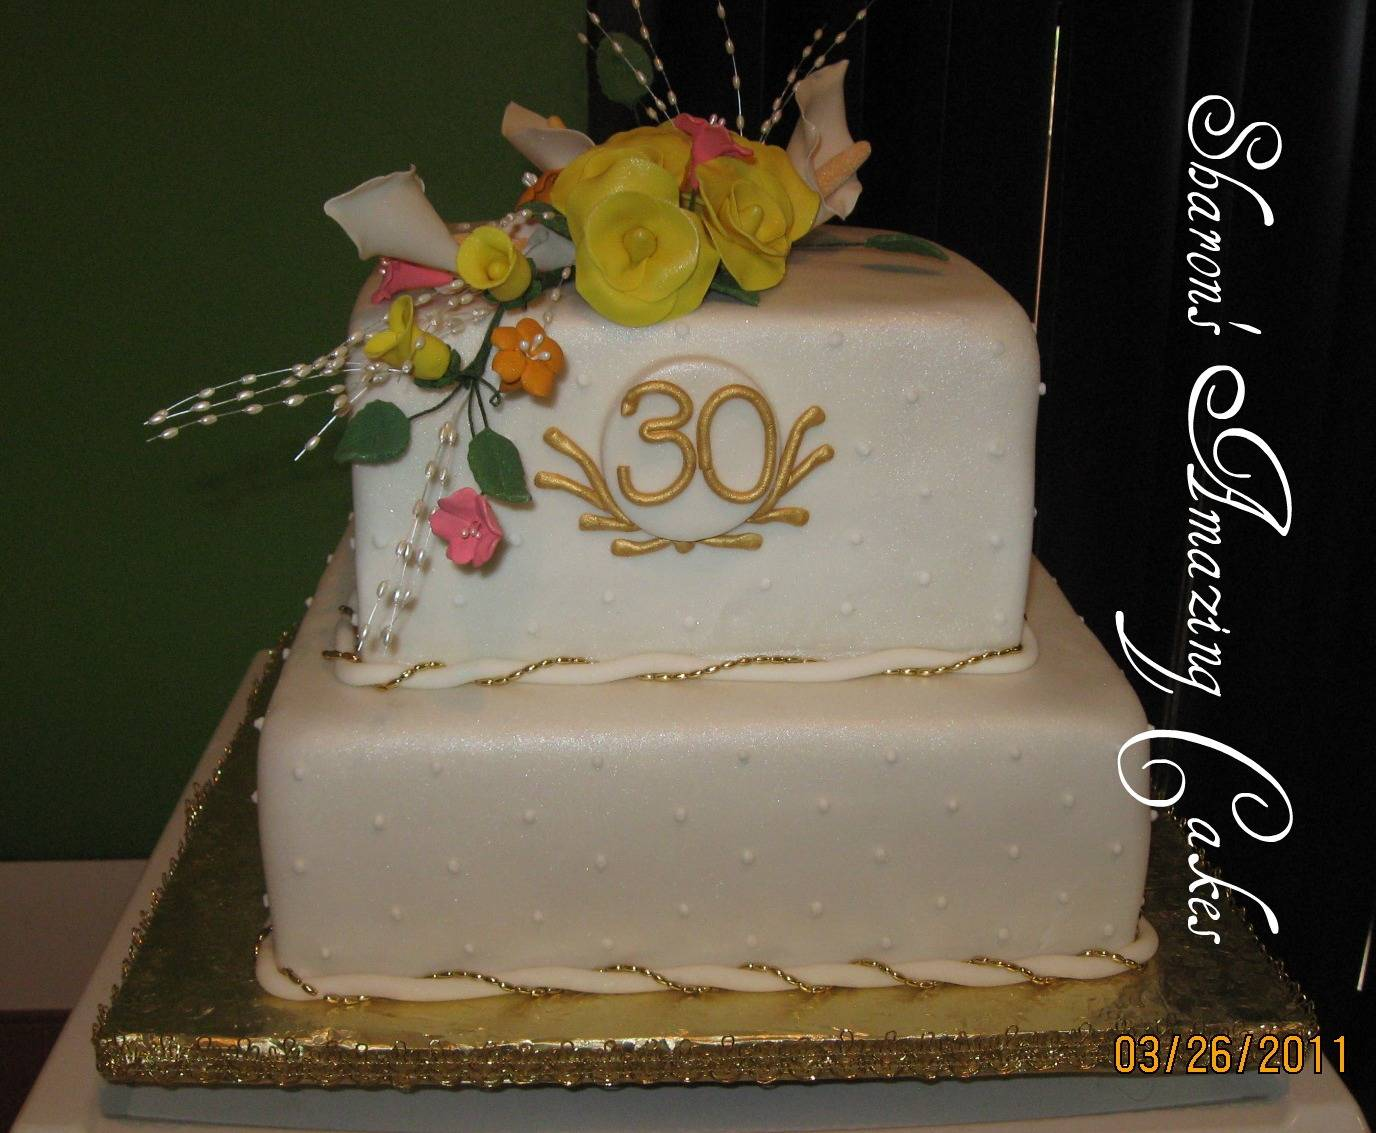 CAKE 27A1 -30th Anniversary Cake